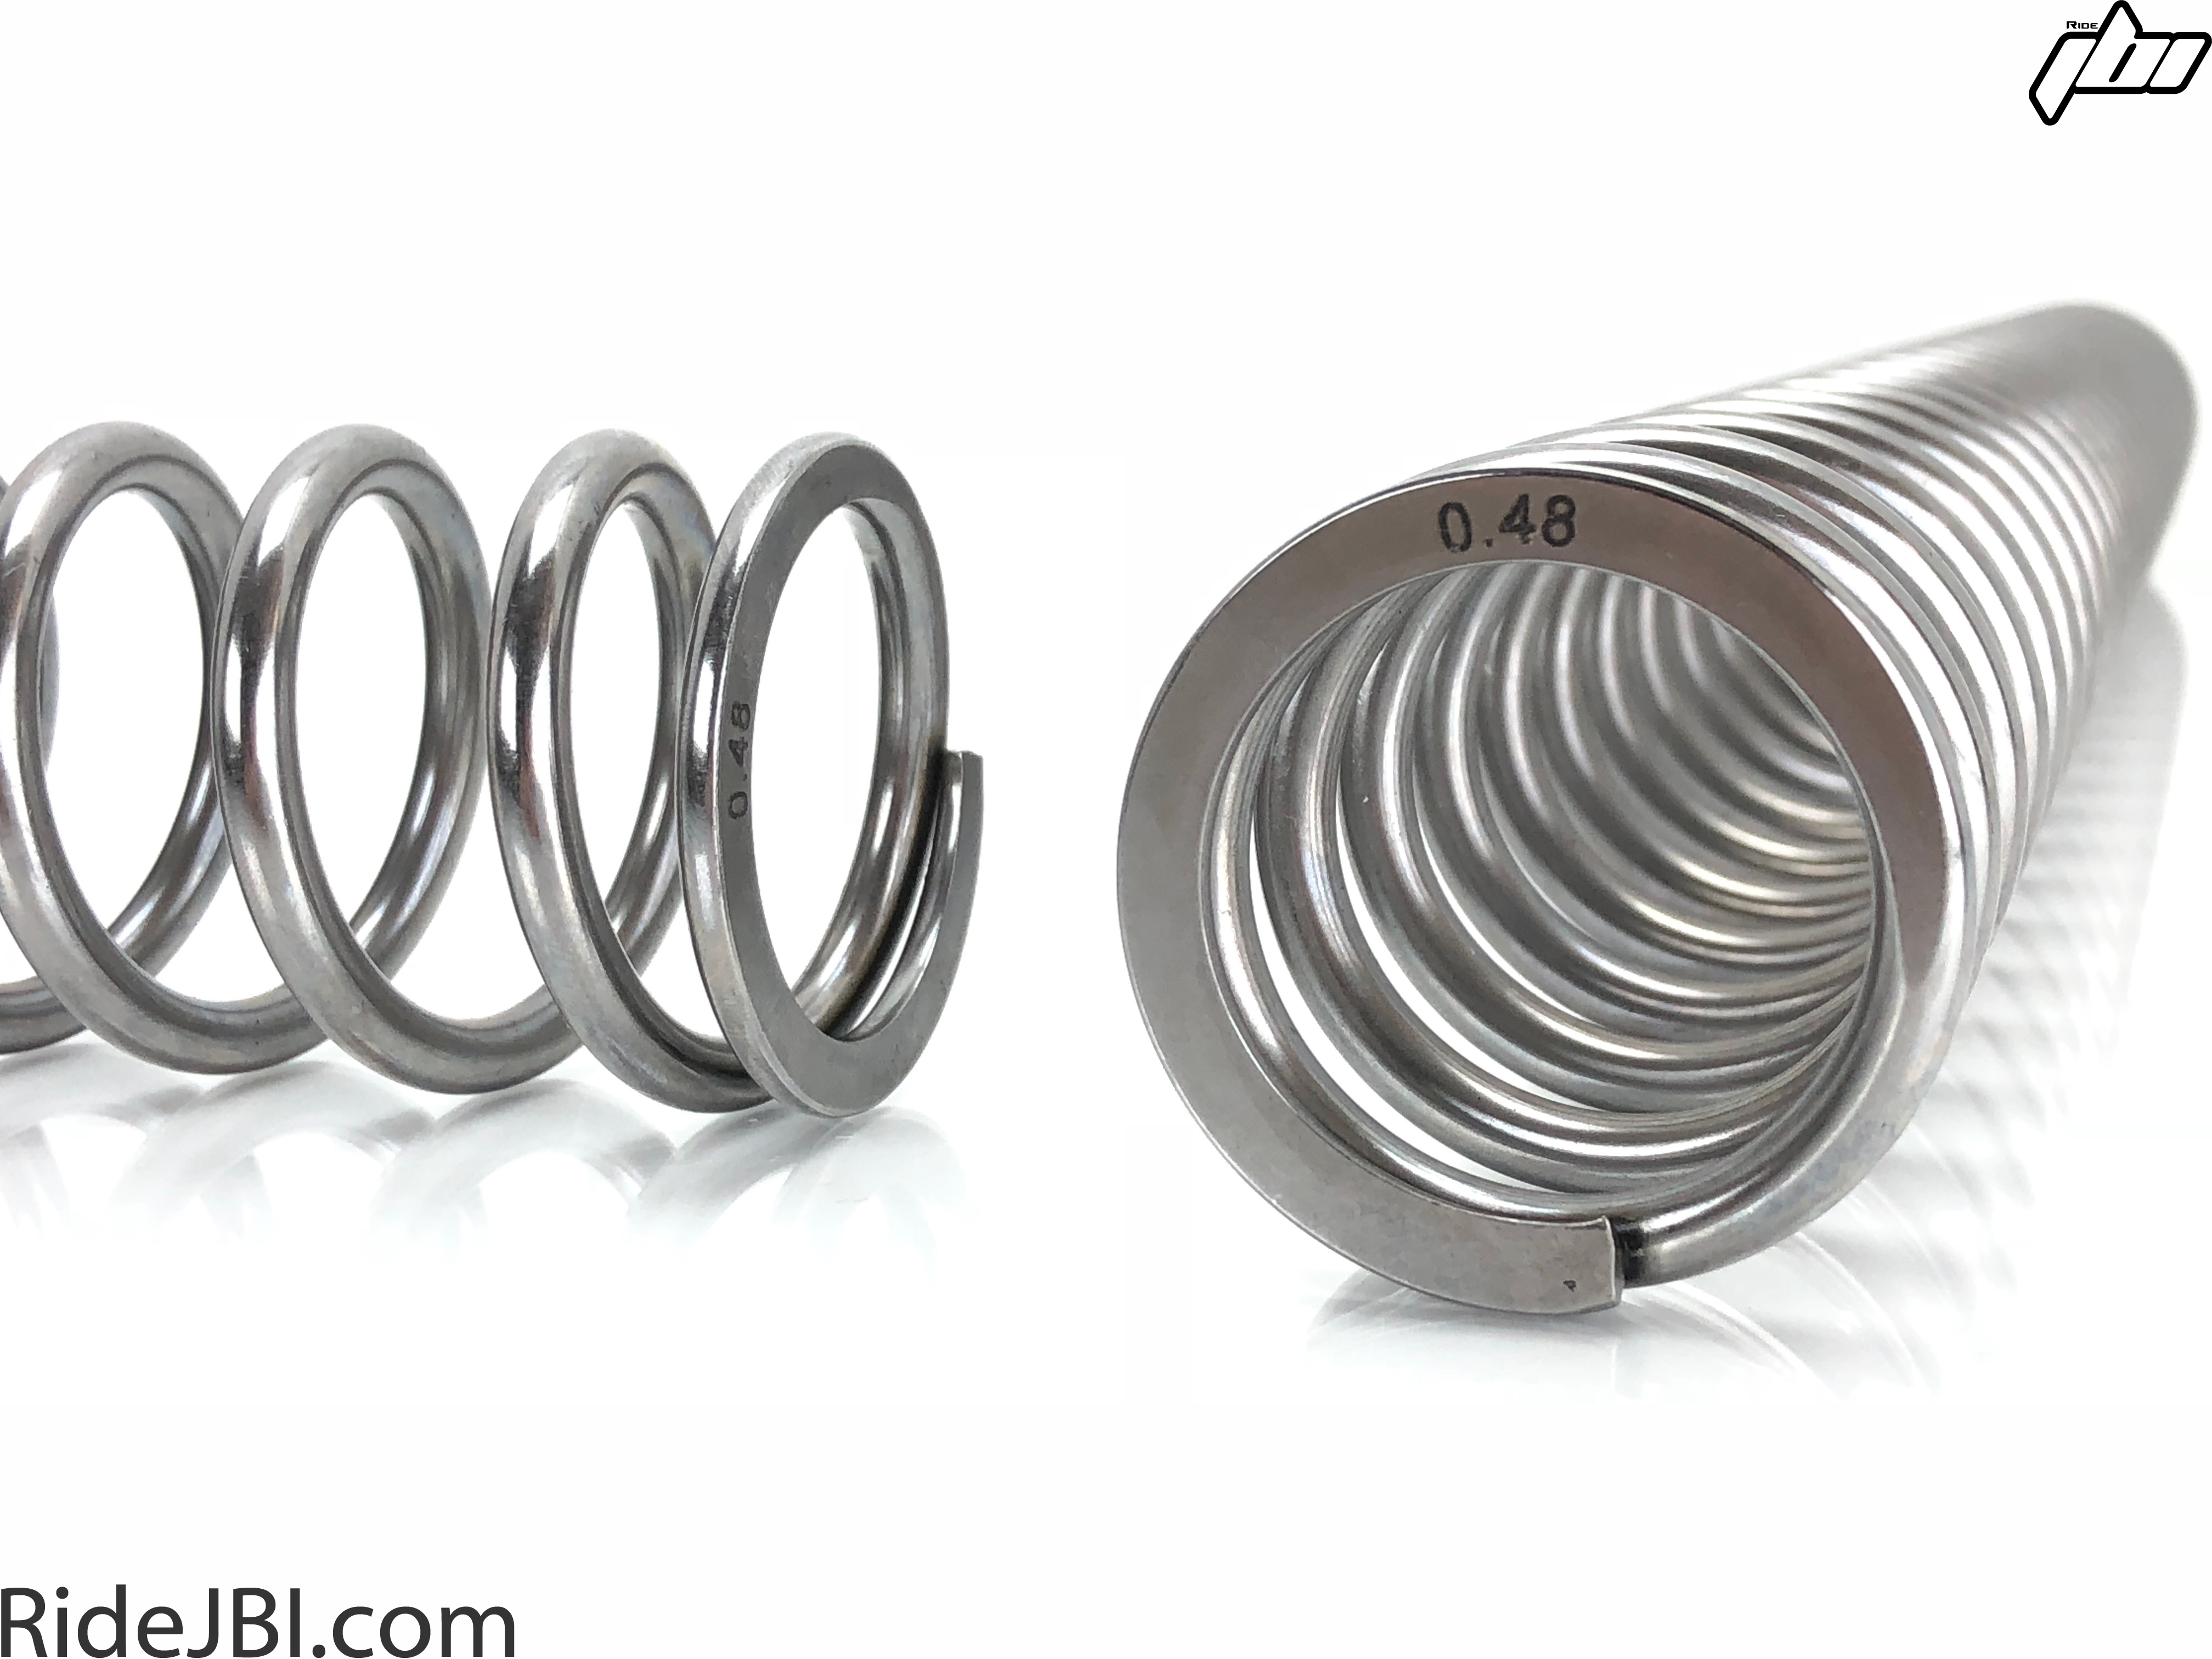 2020 Kawasaki KX450 fork springs